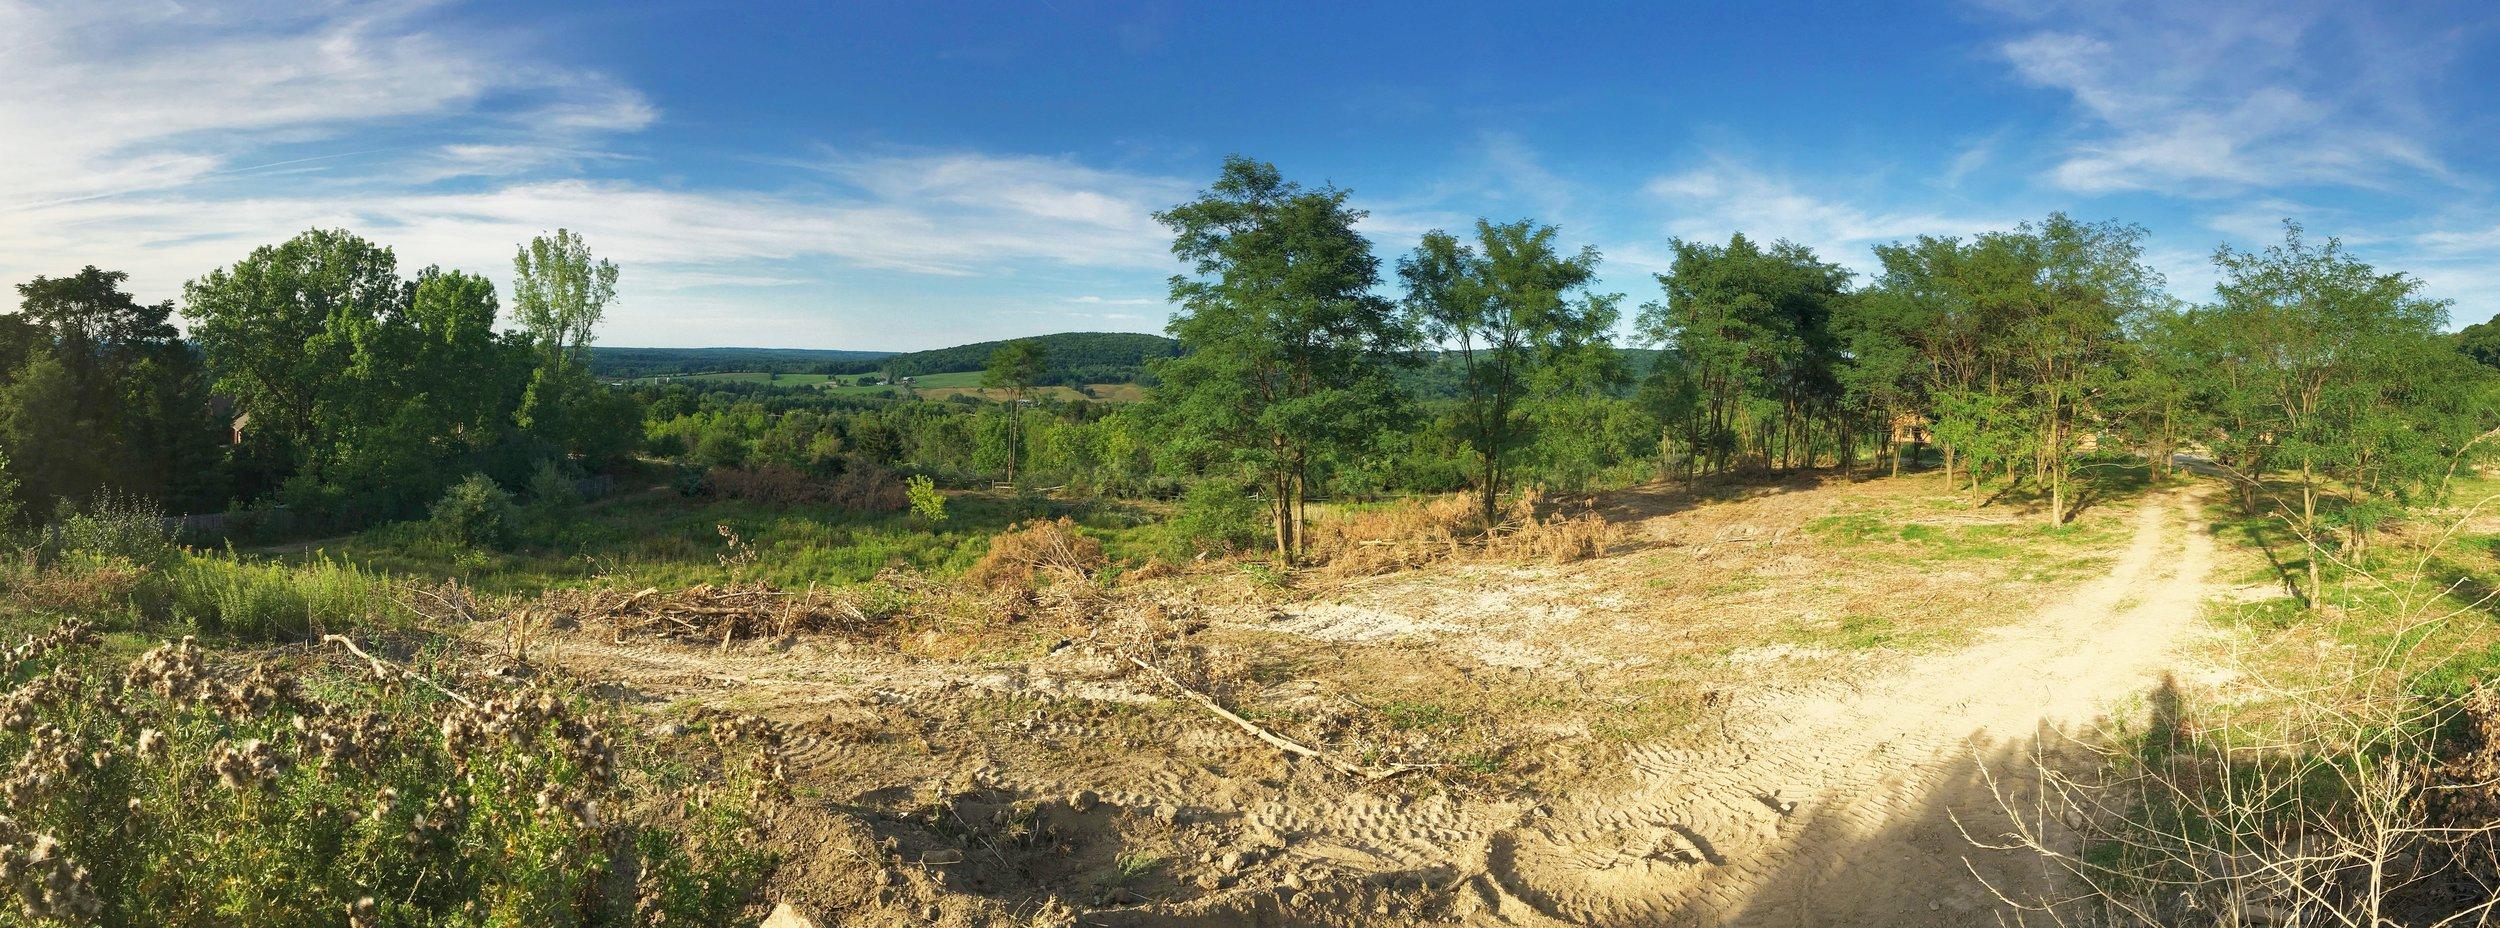 panorama view 2.jpg